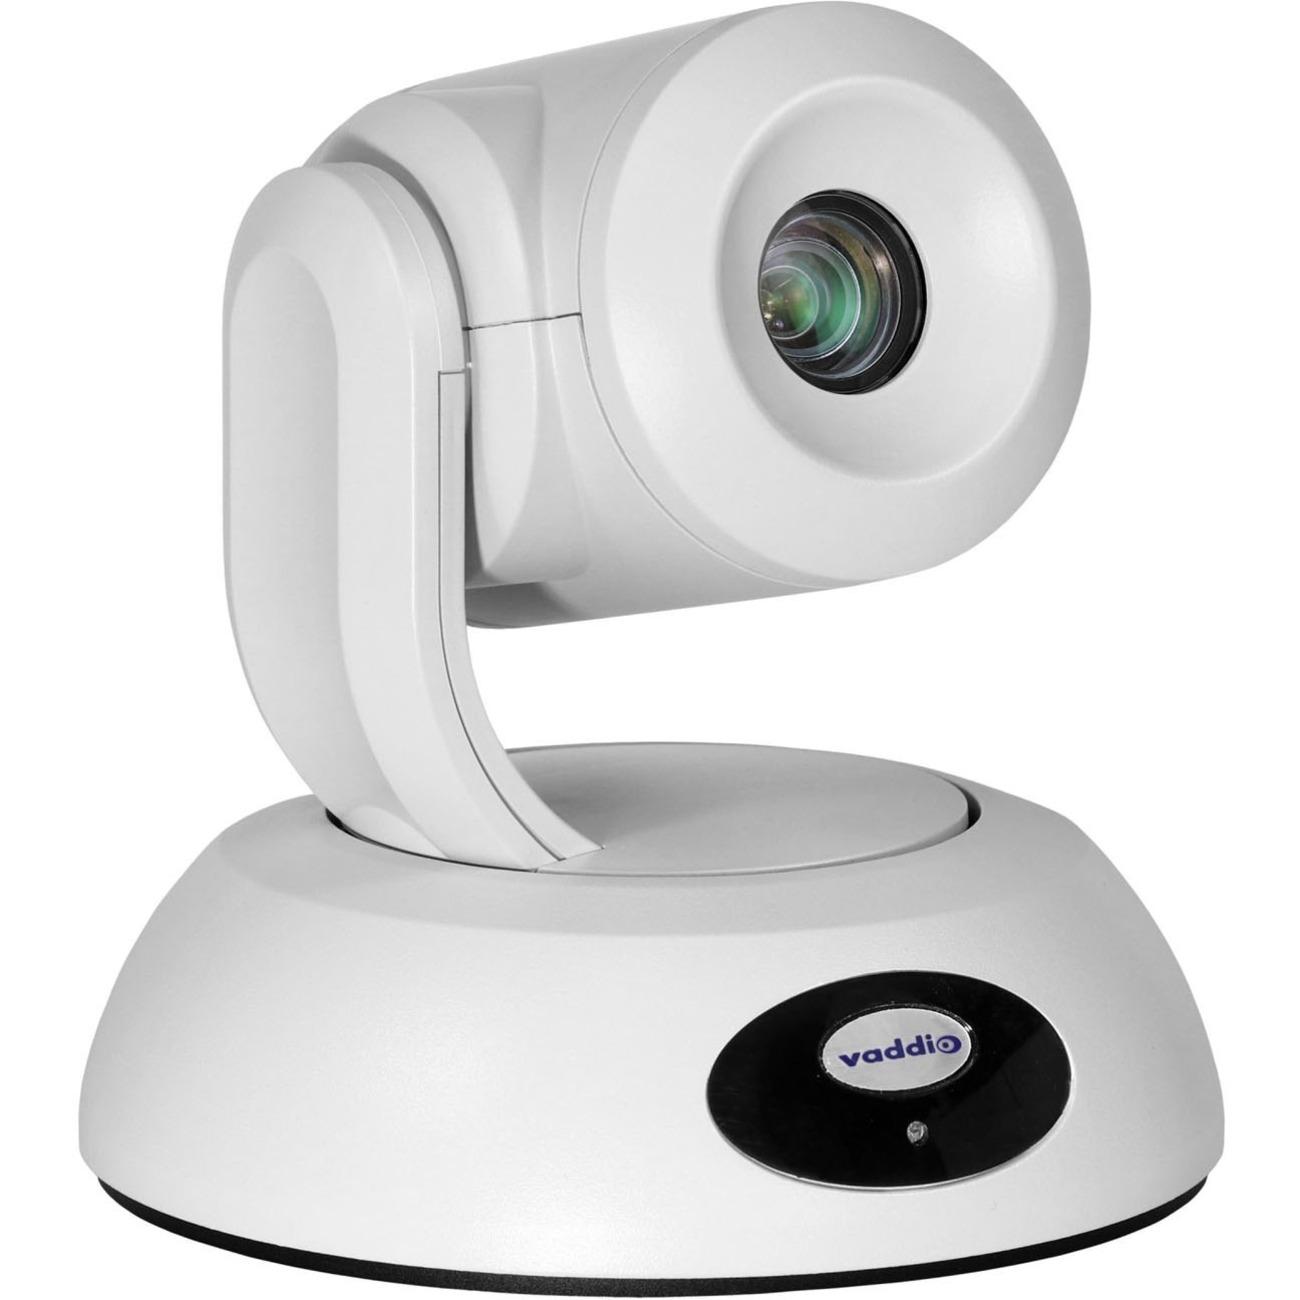 Vaddio RoboSHOT Elite Video Conferencing Camera - 8.5 Megapixel - 60 fps - White_subImage_1